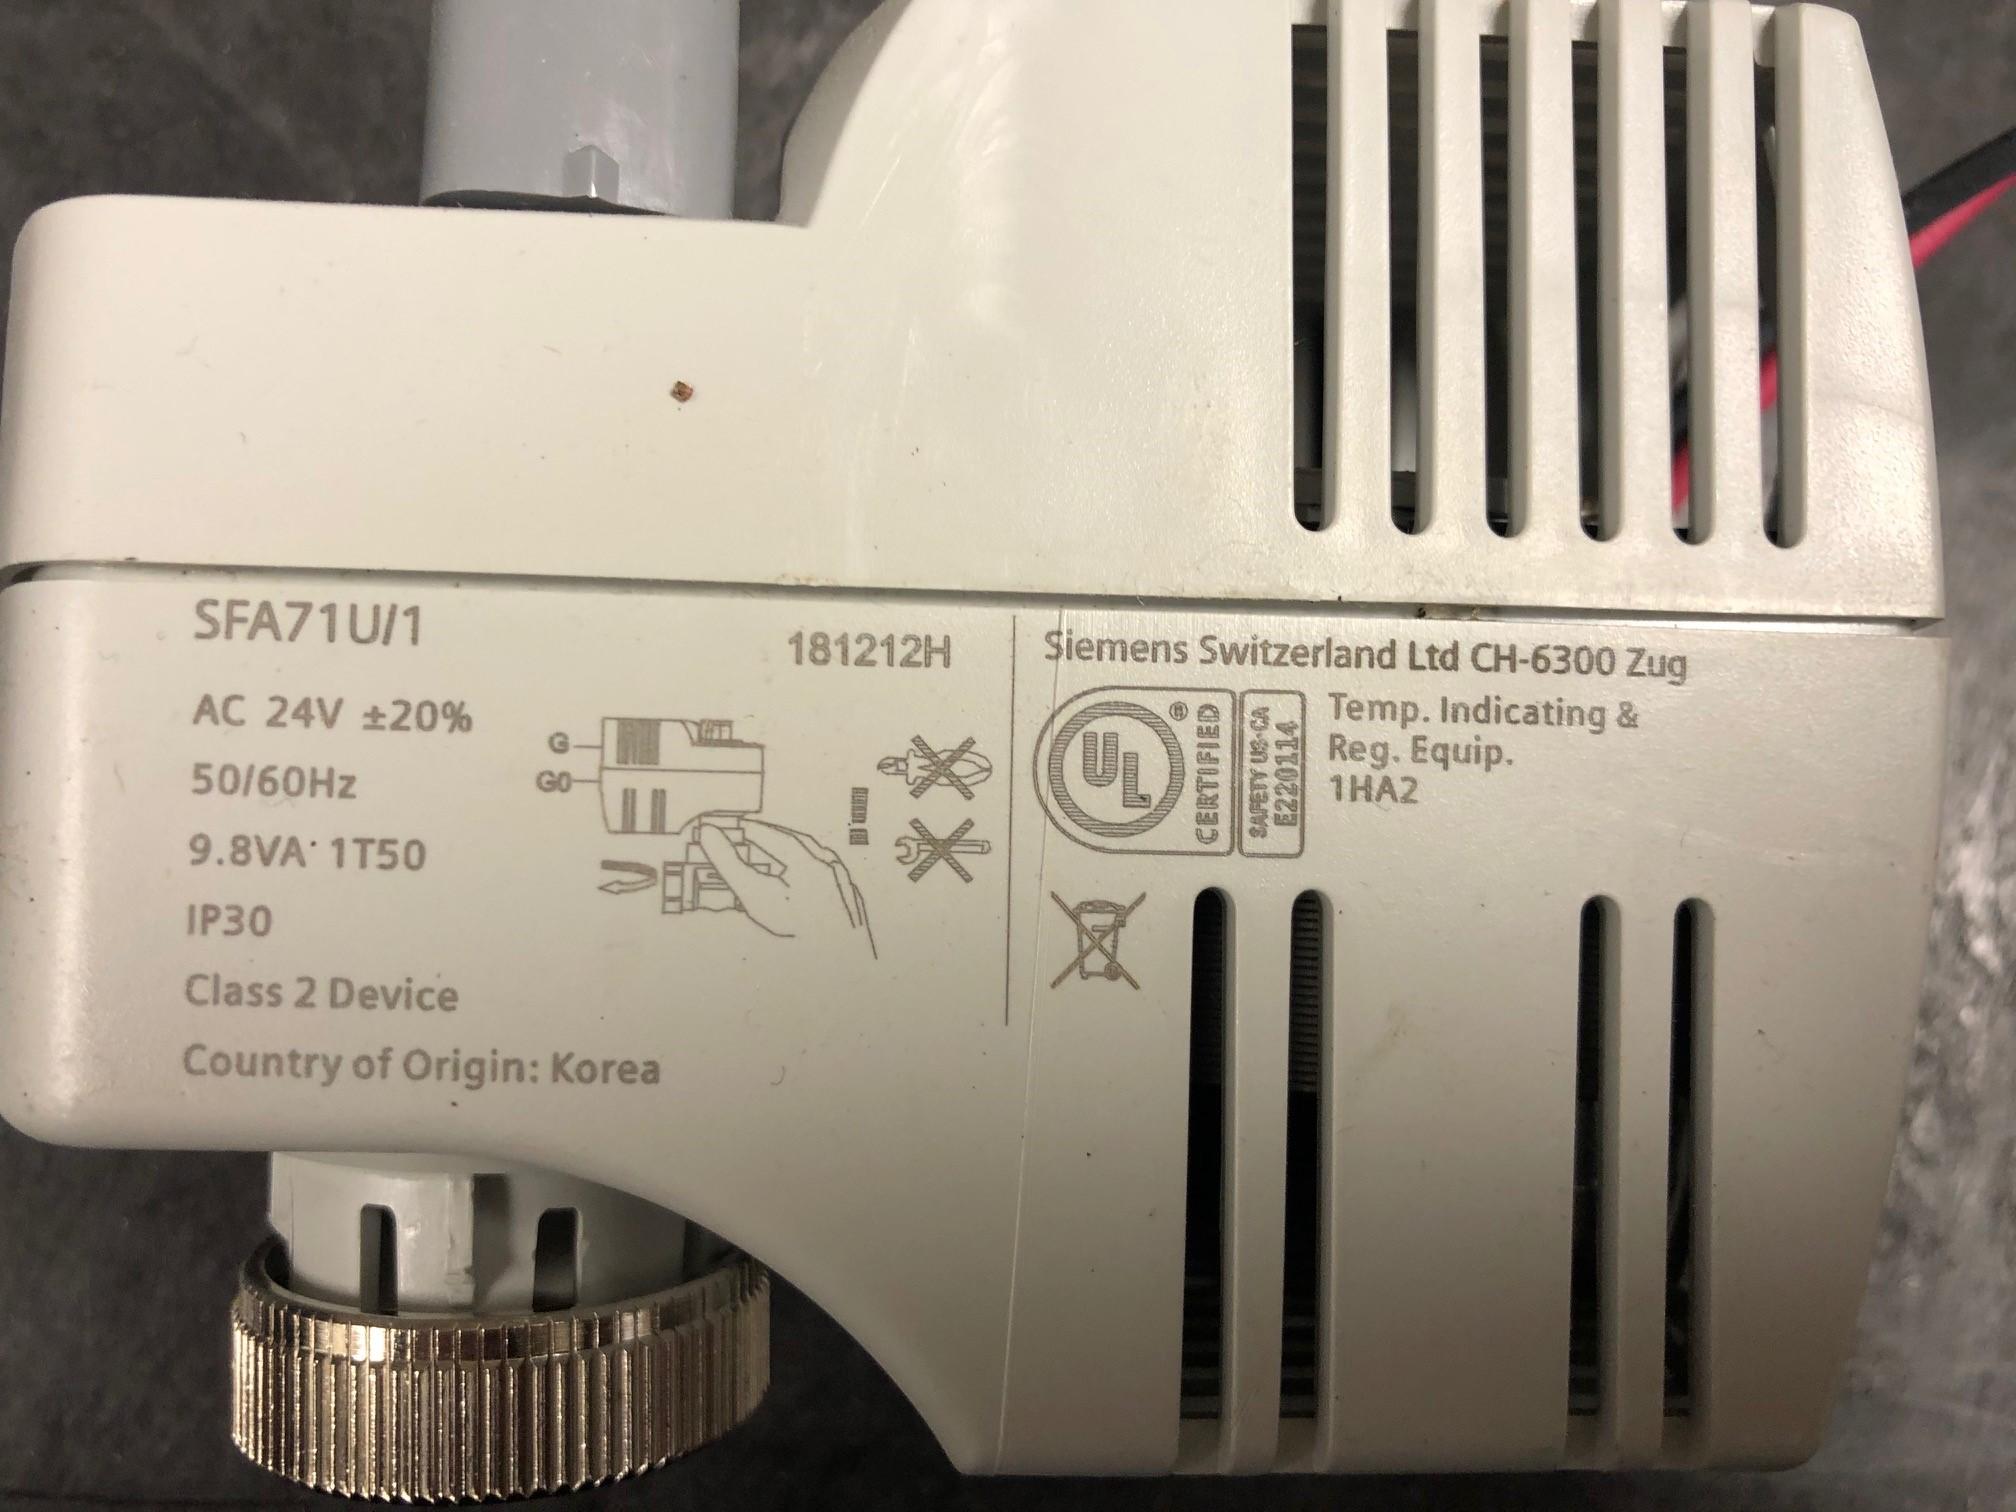 Siemens SFA71u/1